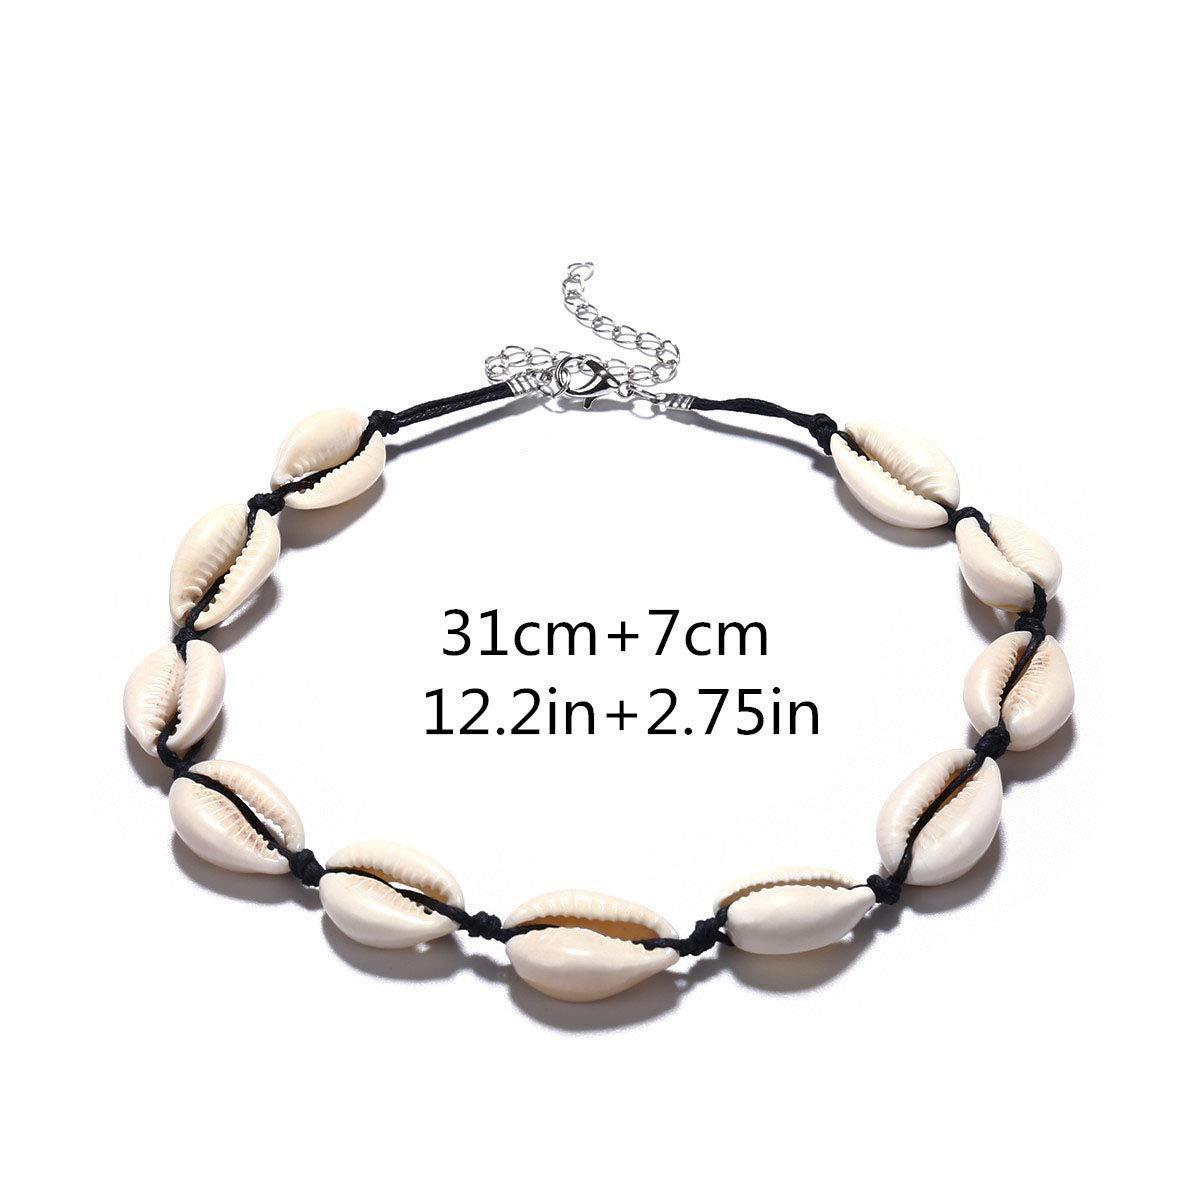 LIPROFE Natural Sea Shell Beads Handmade Hawaii Wakiki Beach Choker Necklace Adjustable Bracelet Anklet for Girls Ladies